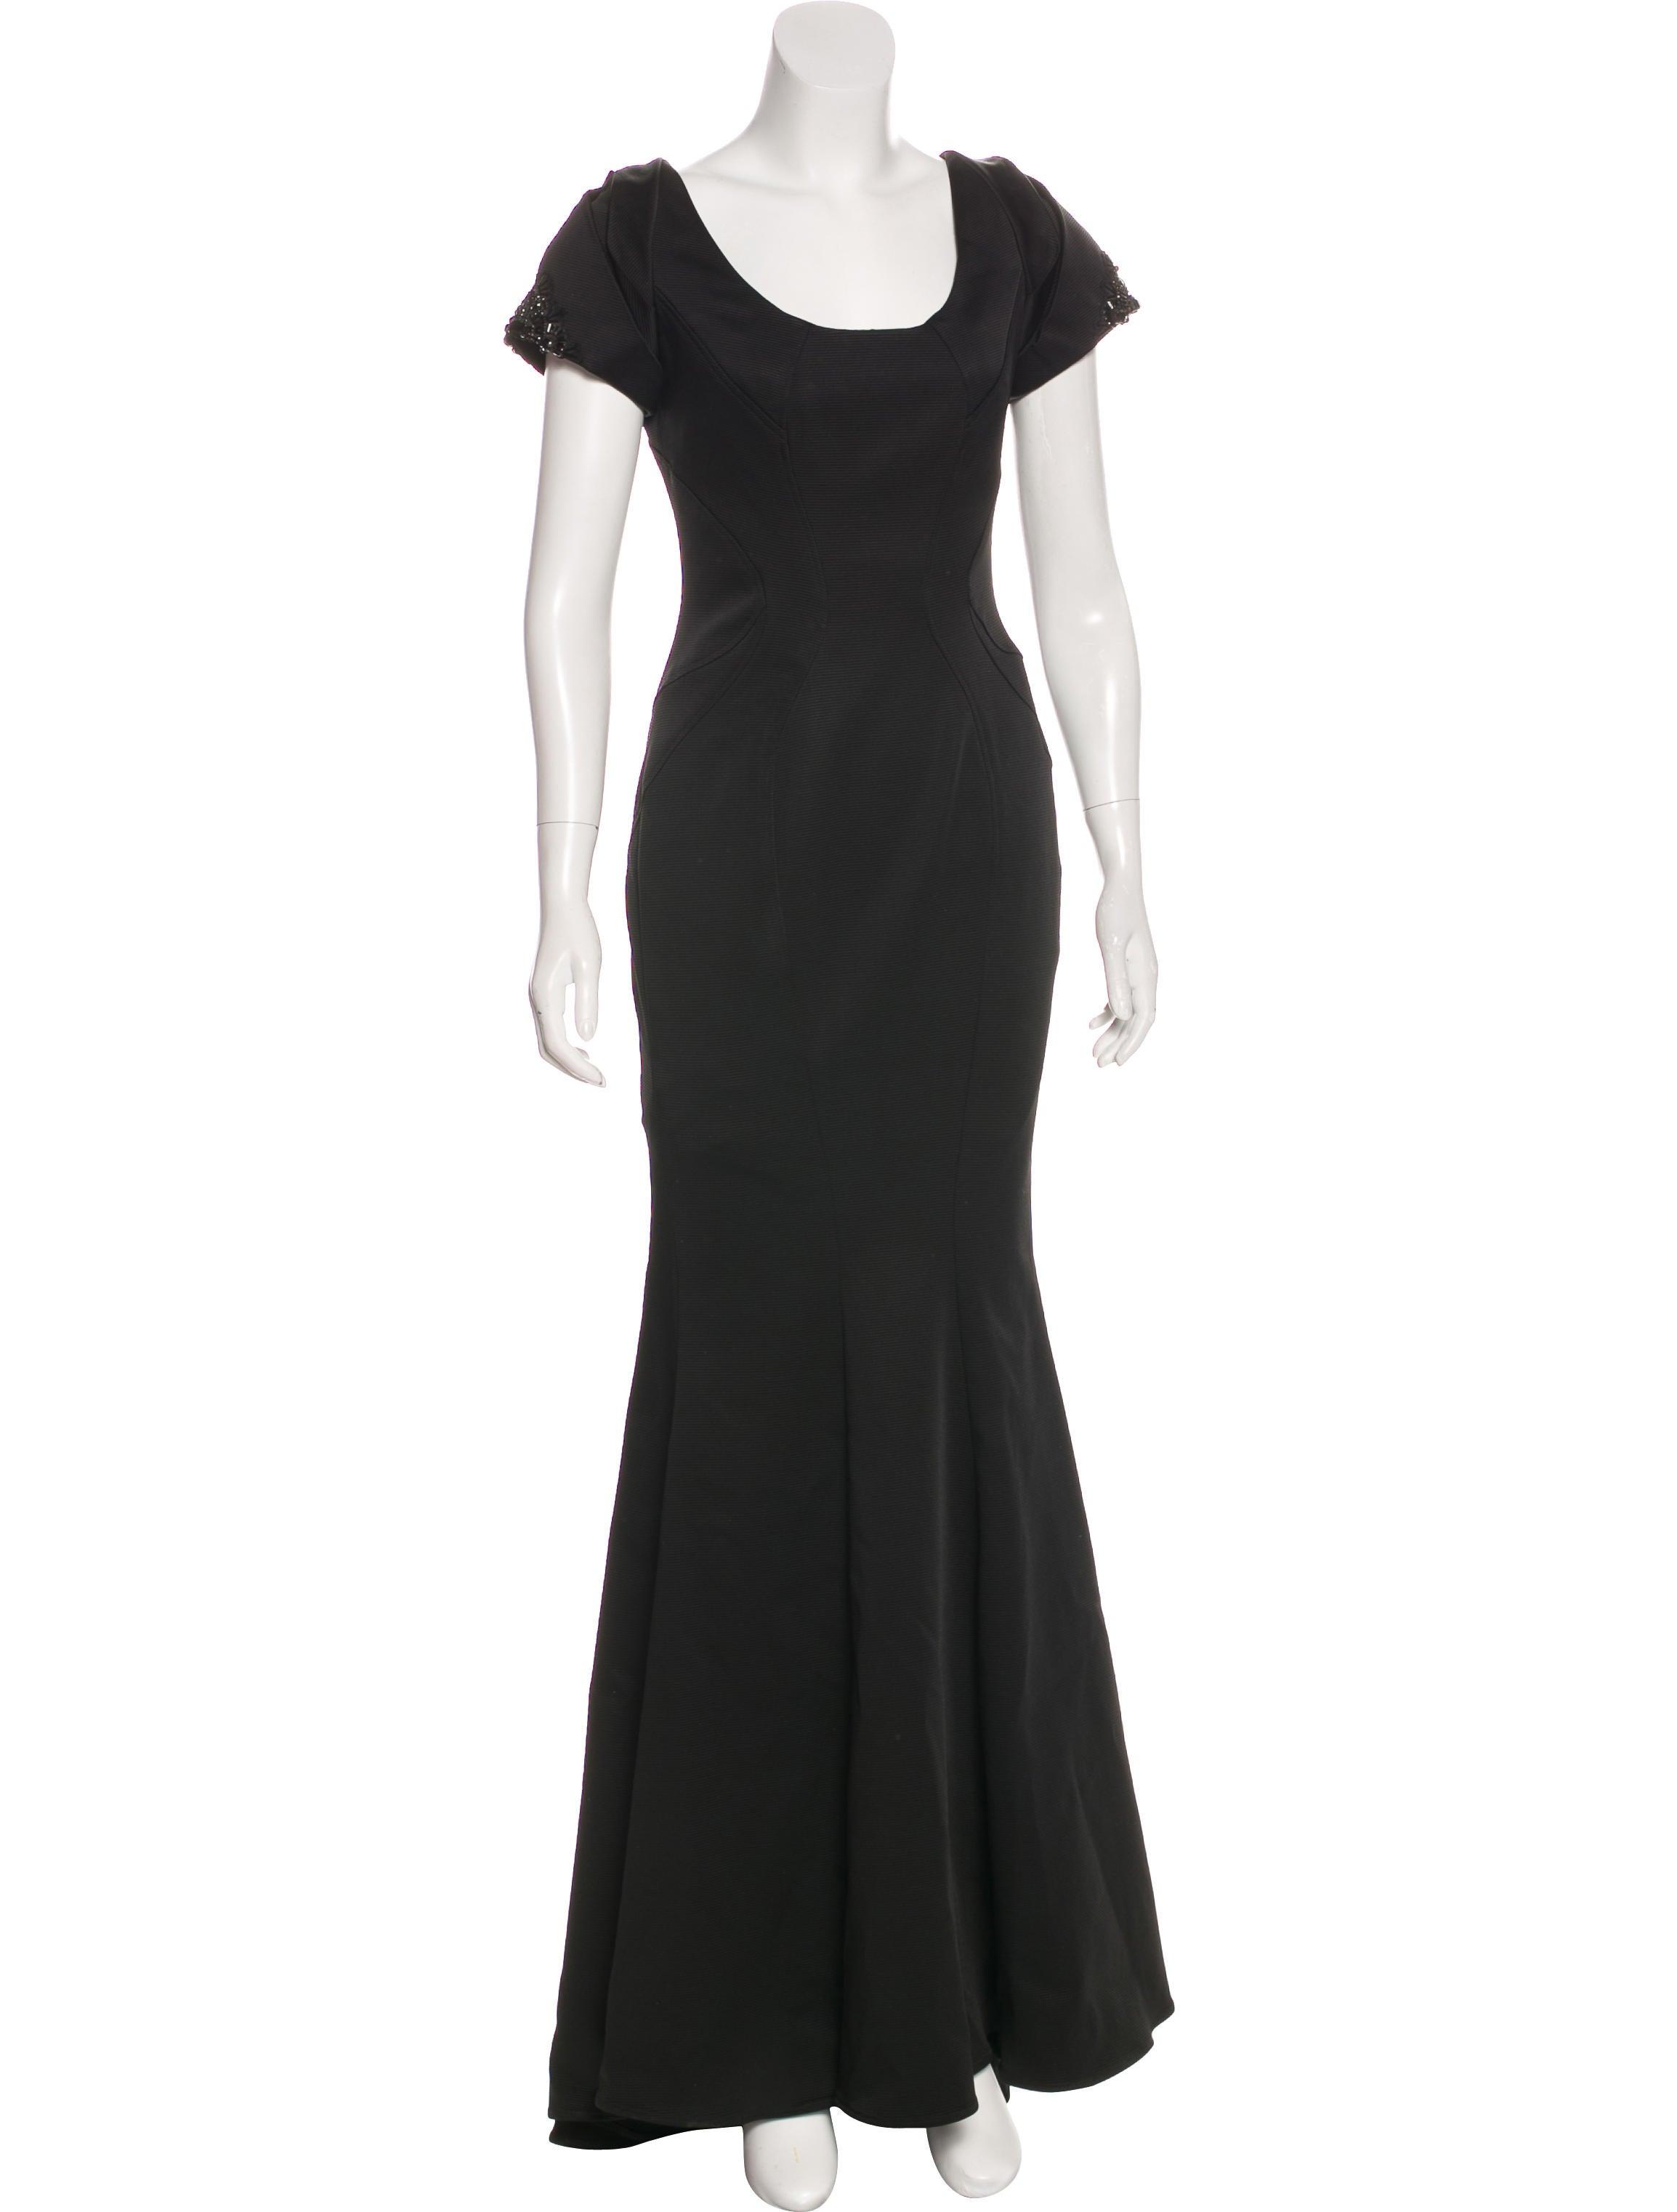 ZAC Zac Posen Embellished Evening Gown - Clothing - WZV22330   The ...